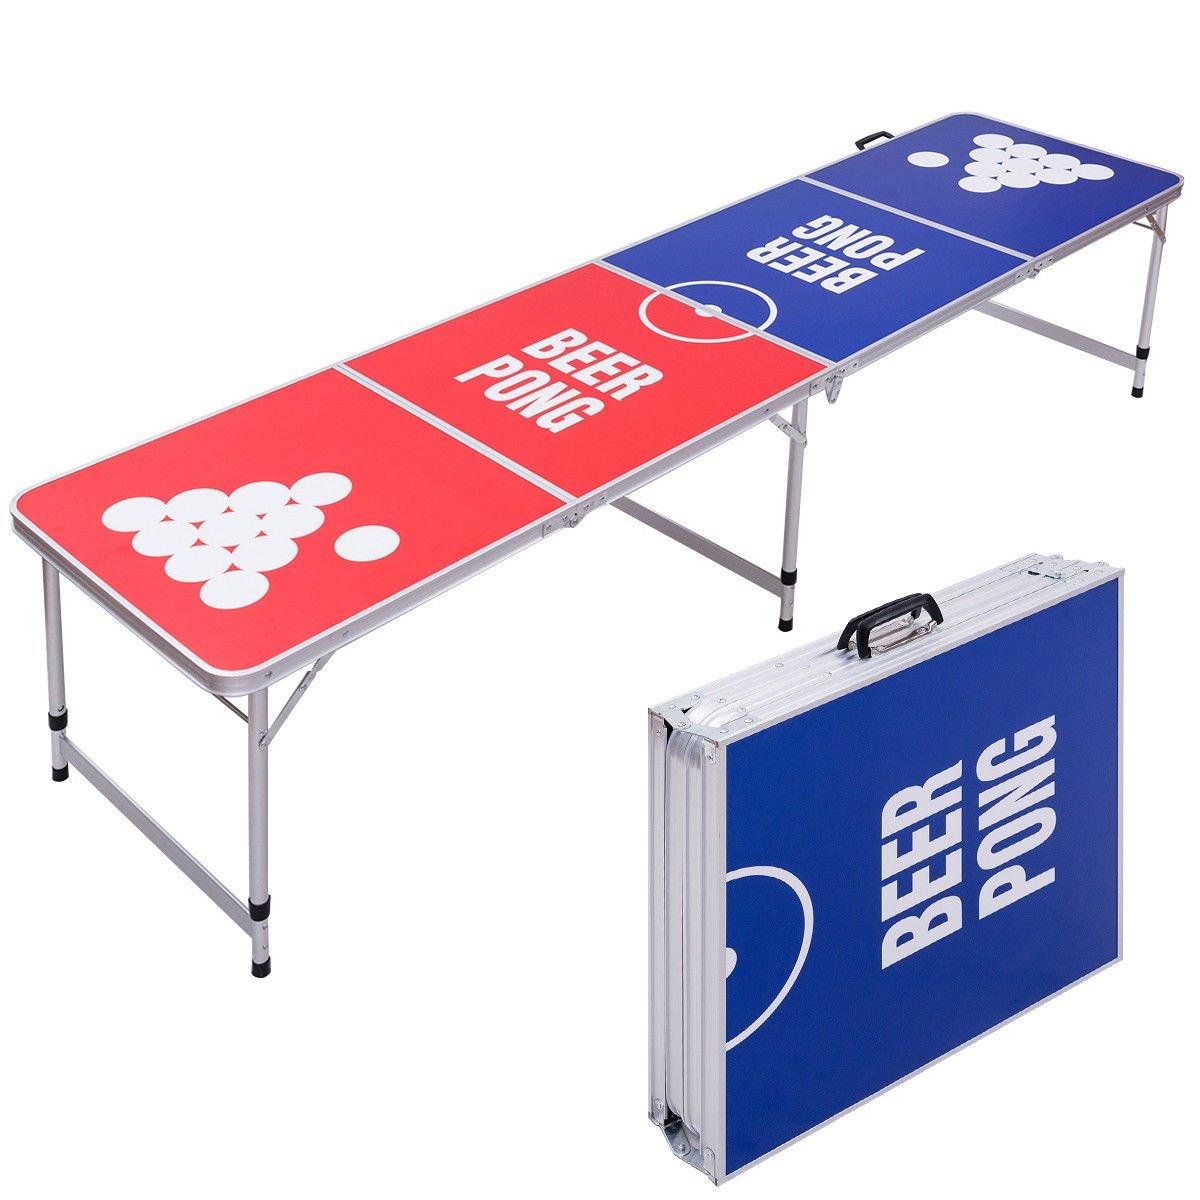 Globe家製品GHP安定性&耐久性軽量アルミ防水8 ' Foldable Beer Pong Table B07CFW94R6